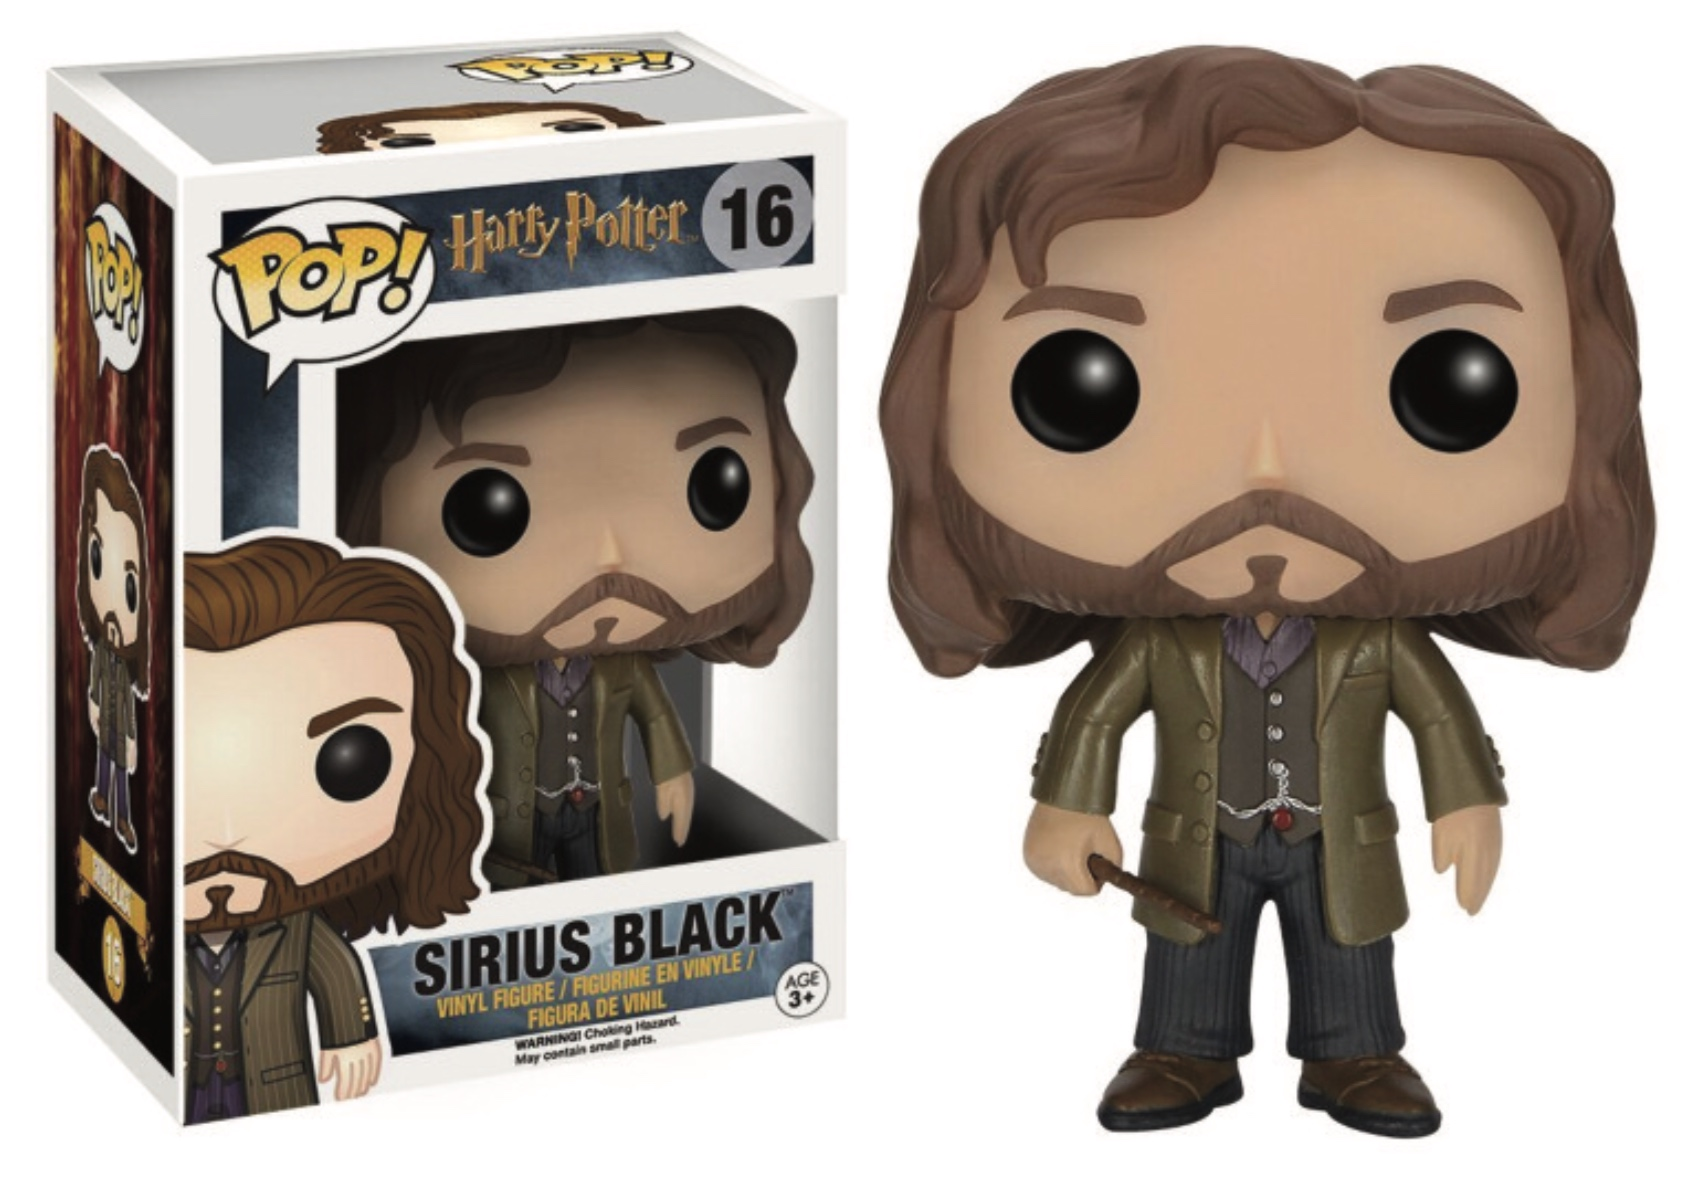 Harry Potter POP! Movies Vinyl Figure Sirius Black 9 cm